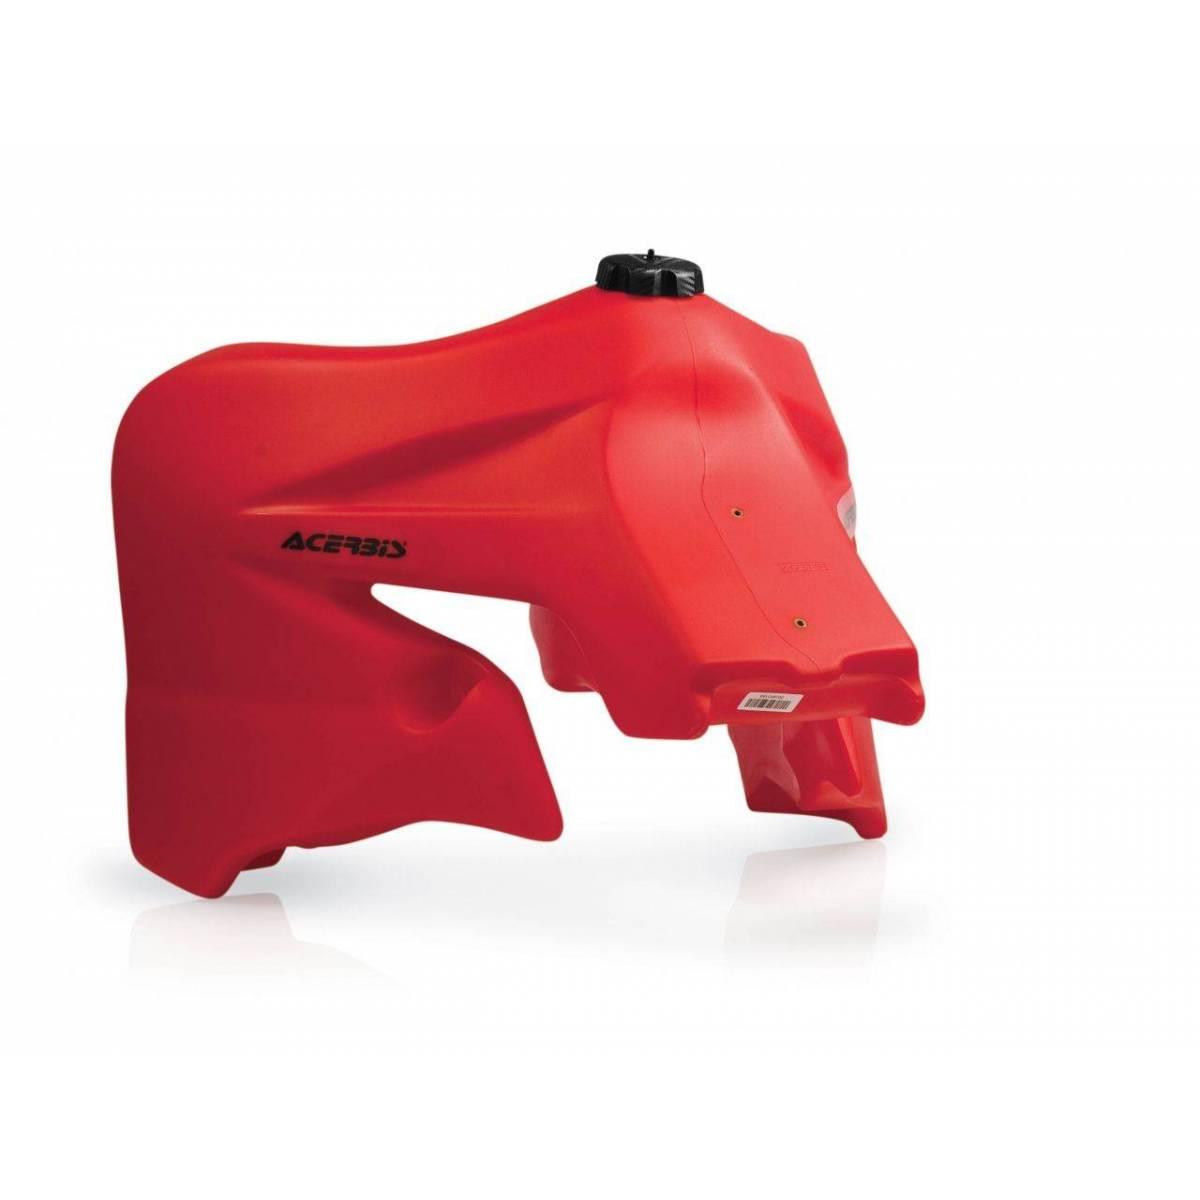 0008429-110 - Deposito Crf 450X 25L 05 16 Rojo